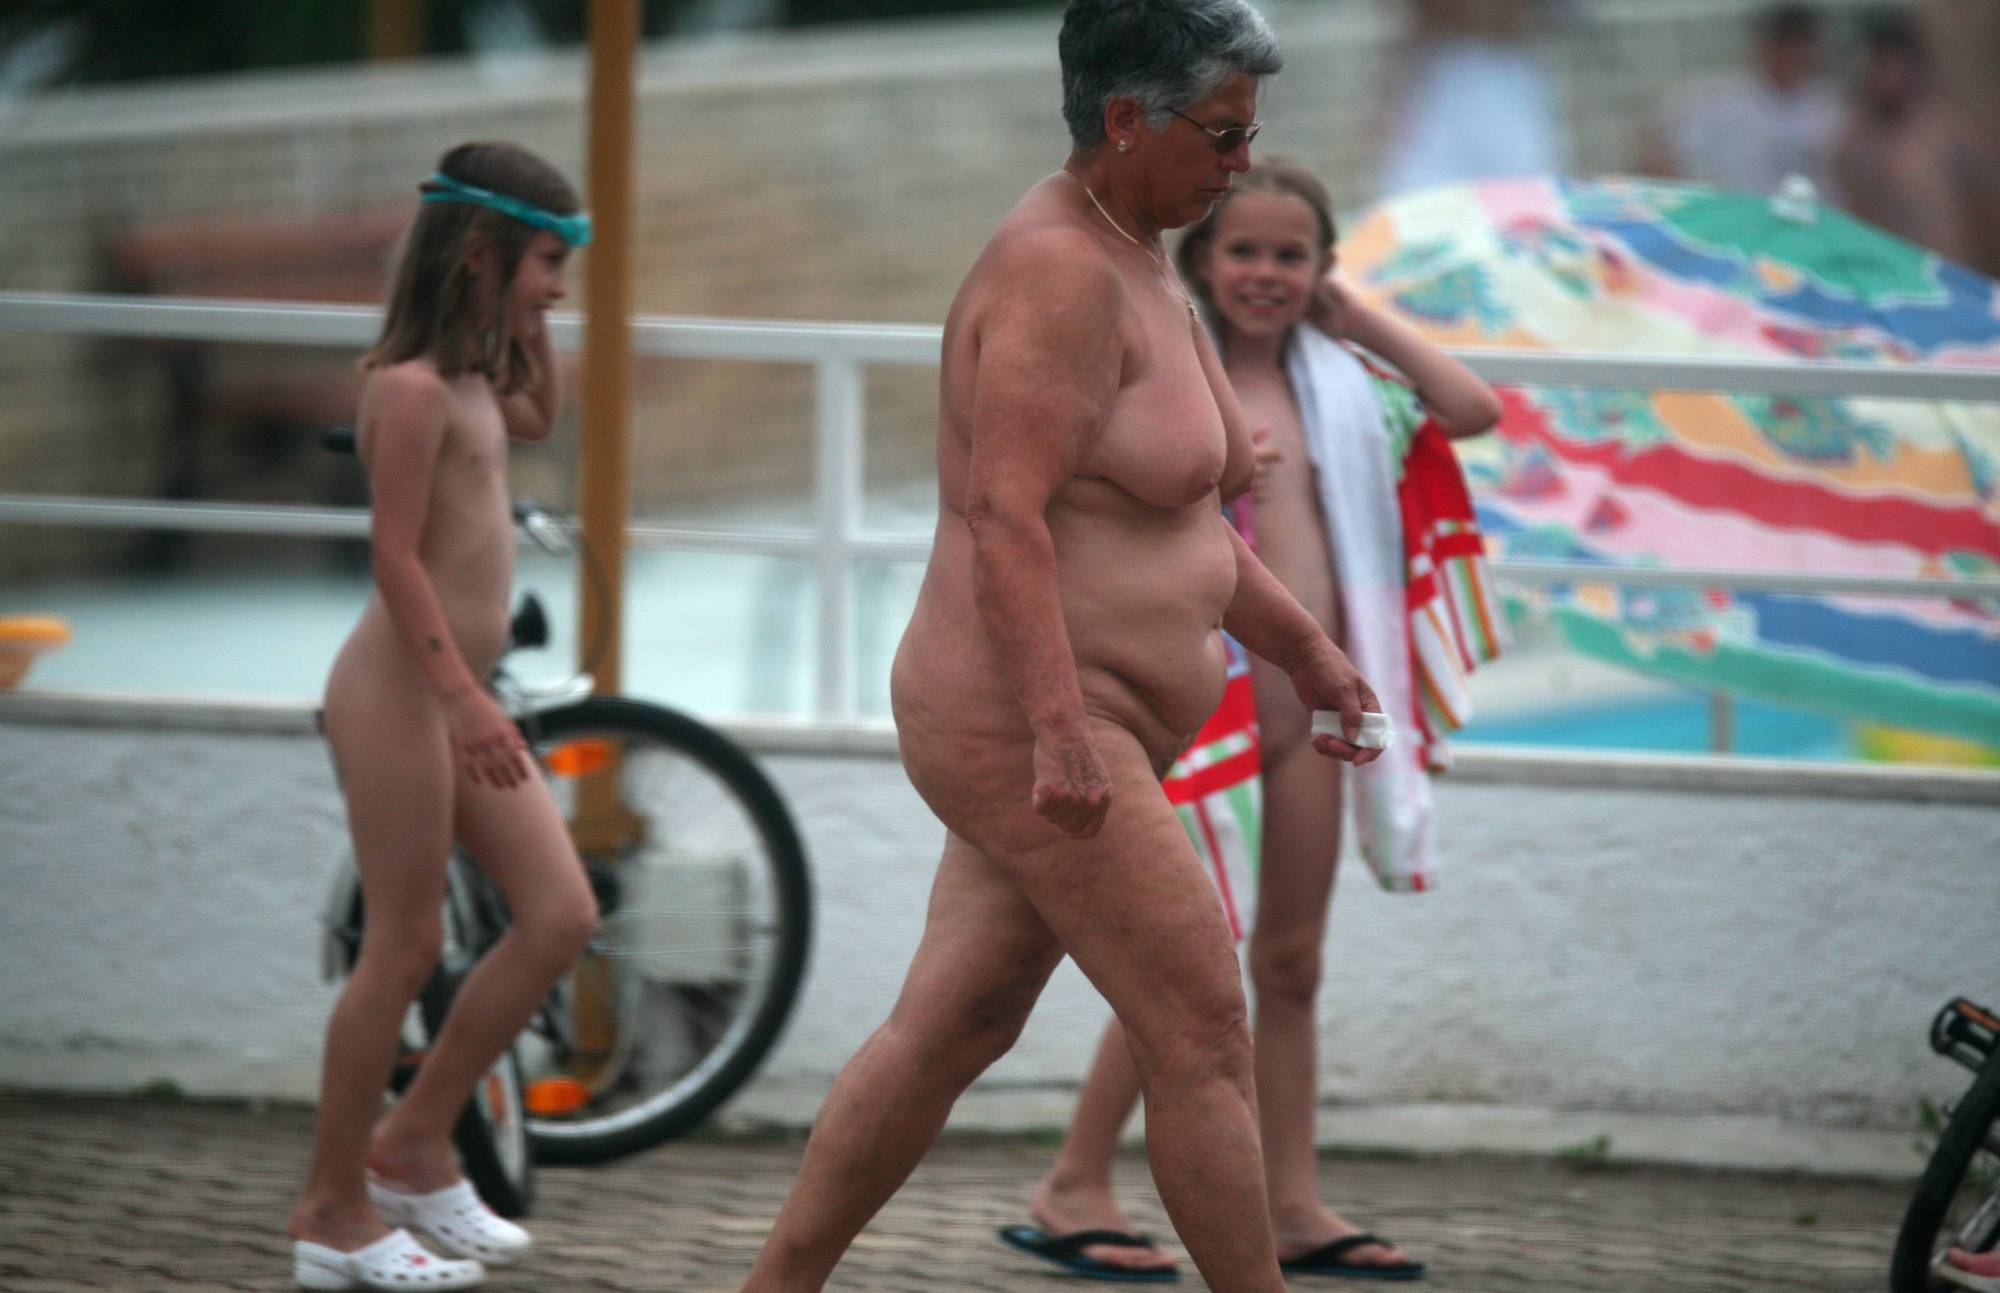 Pure Nudism Photos-Nude Walk and Biking Trail - 3